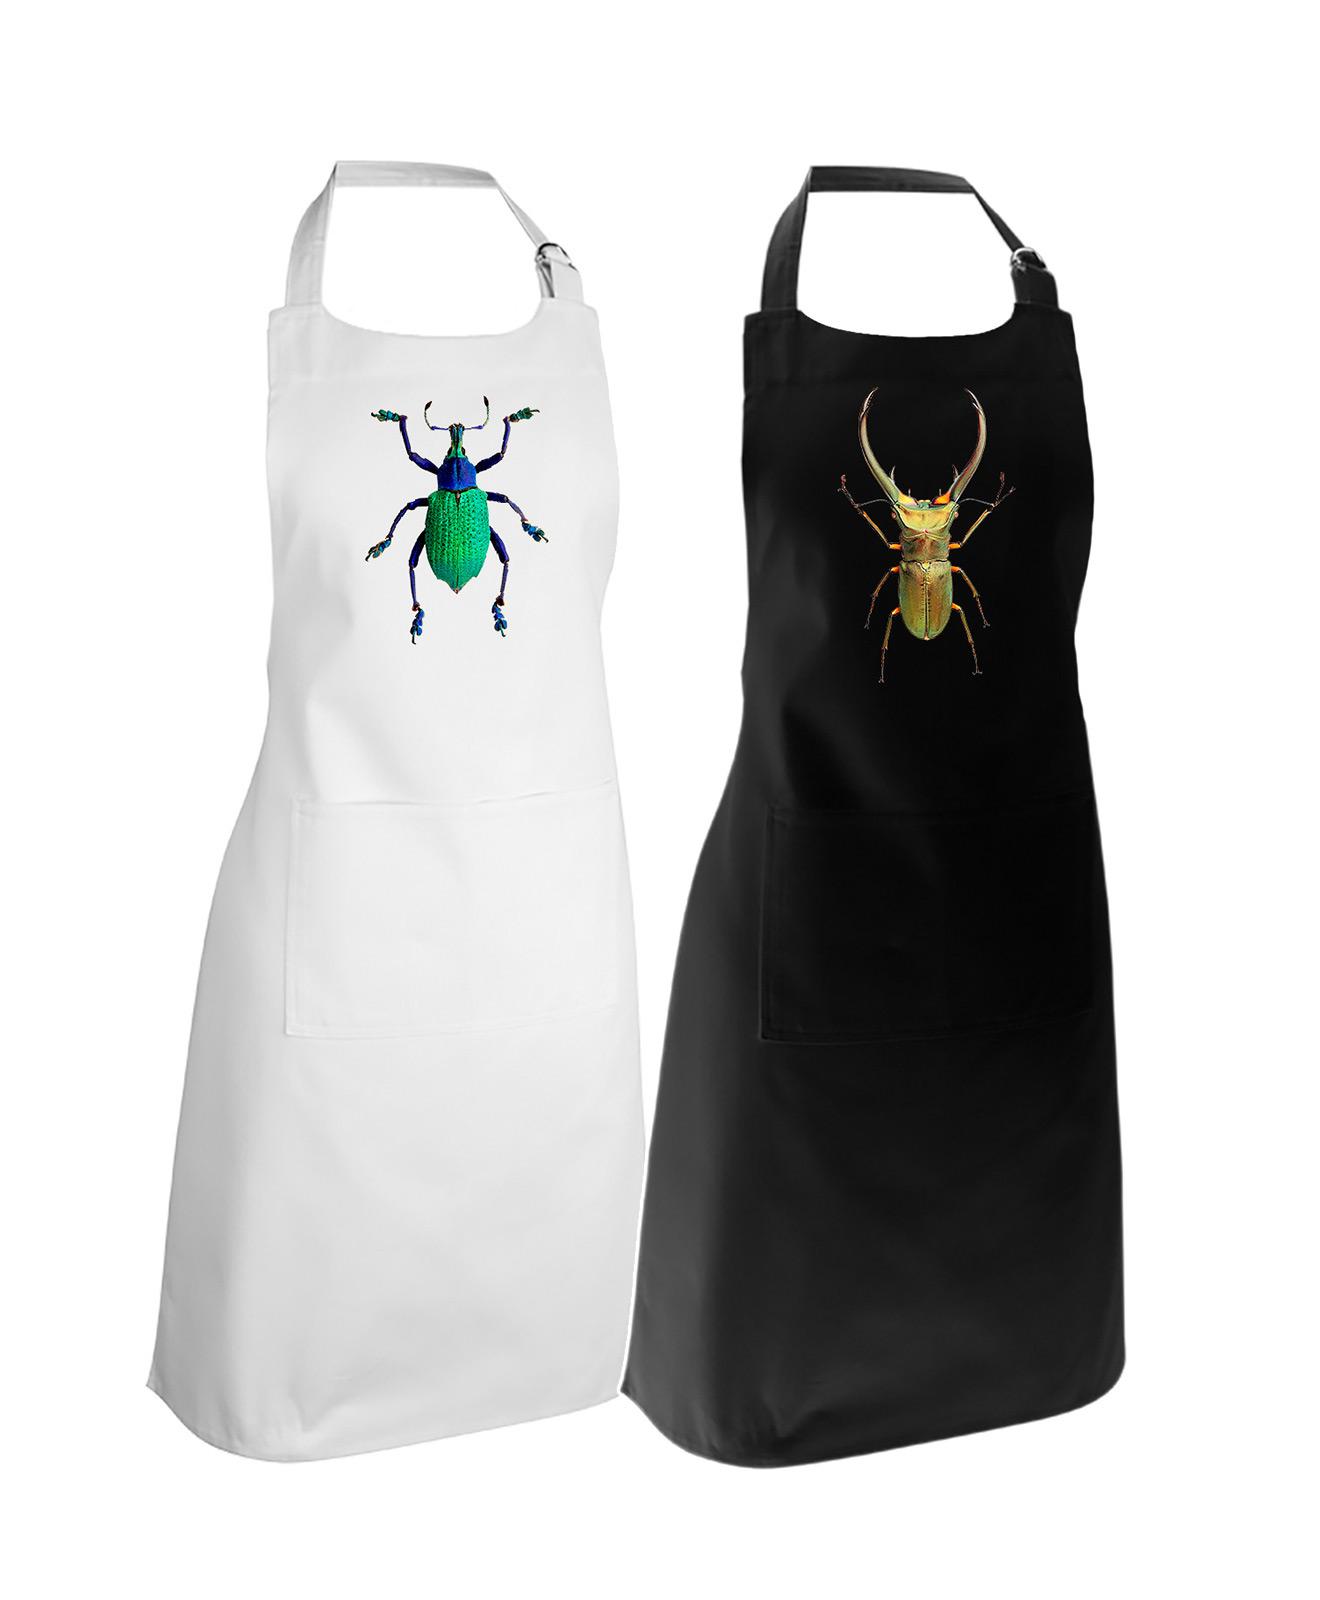 Big Bugs Apron Duo